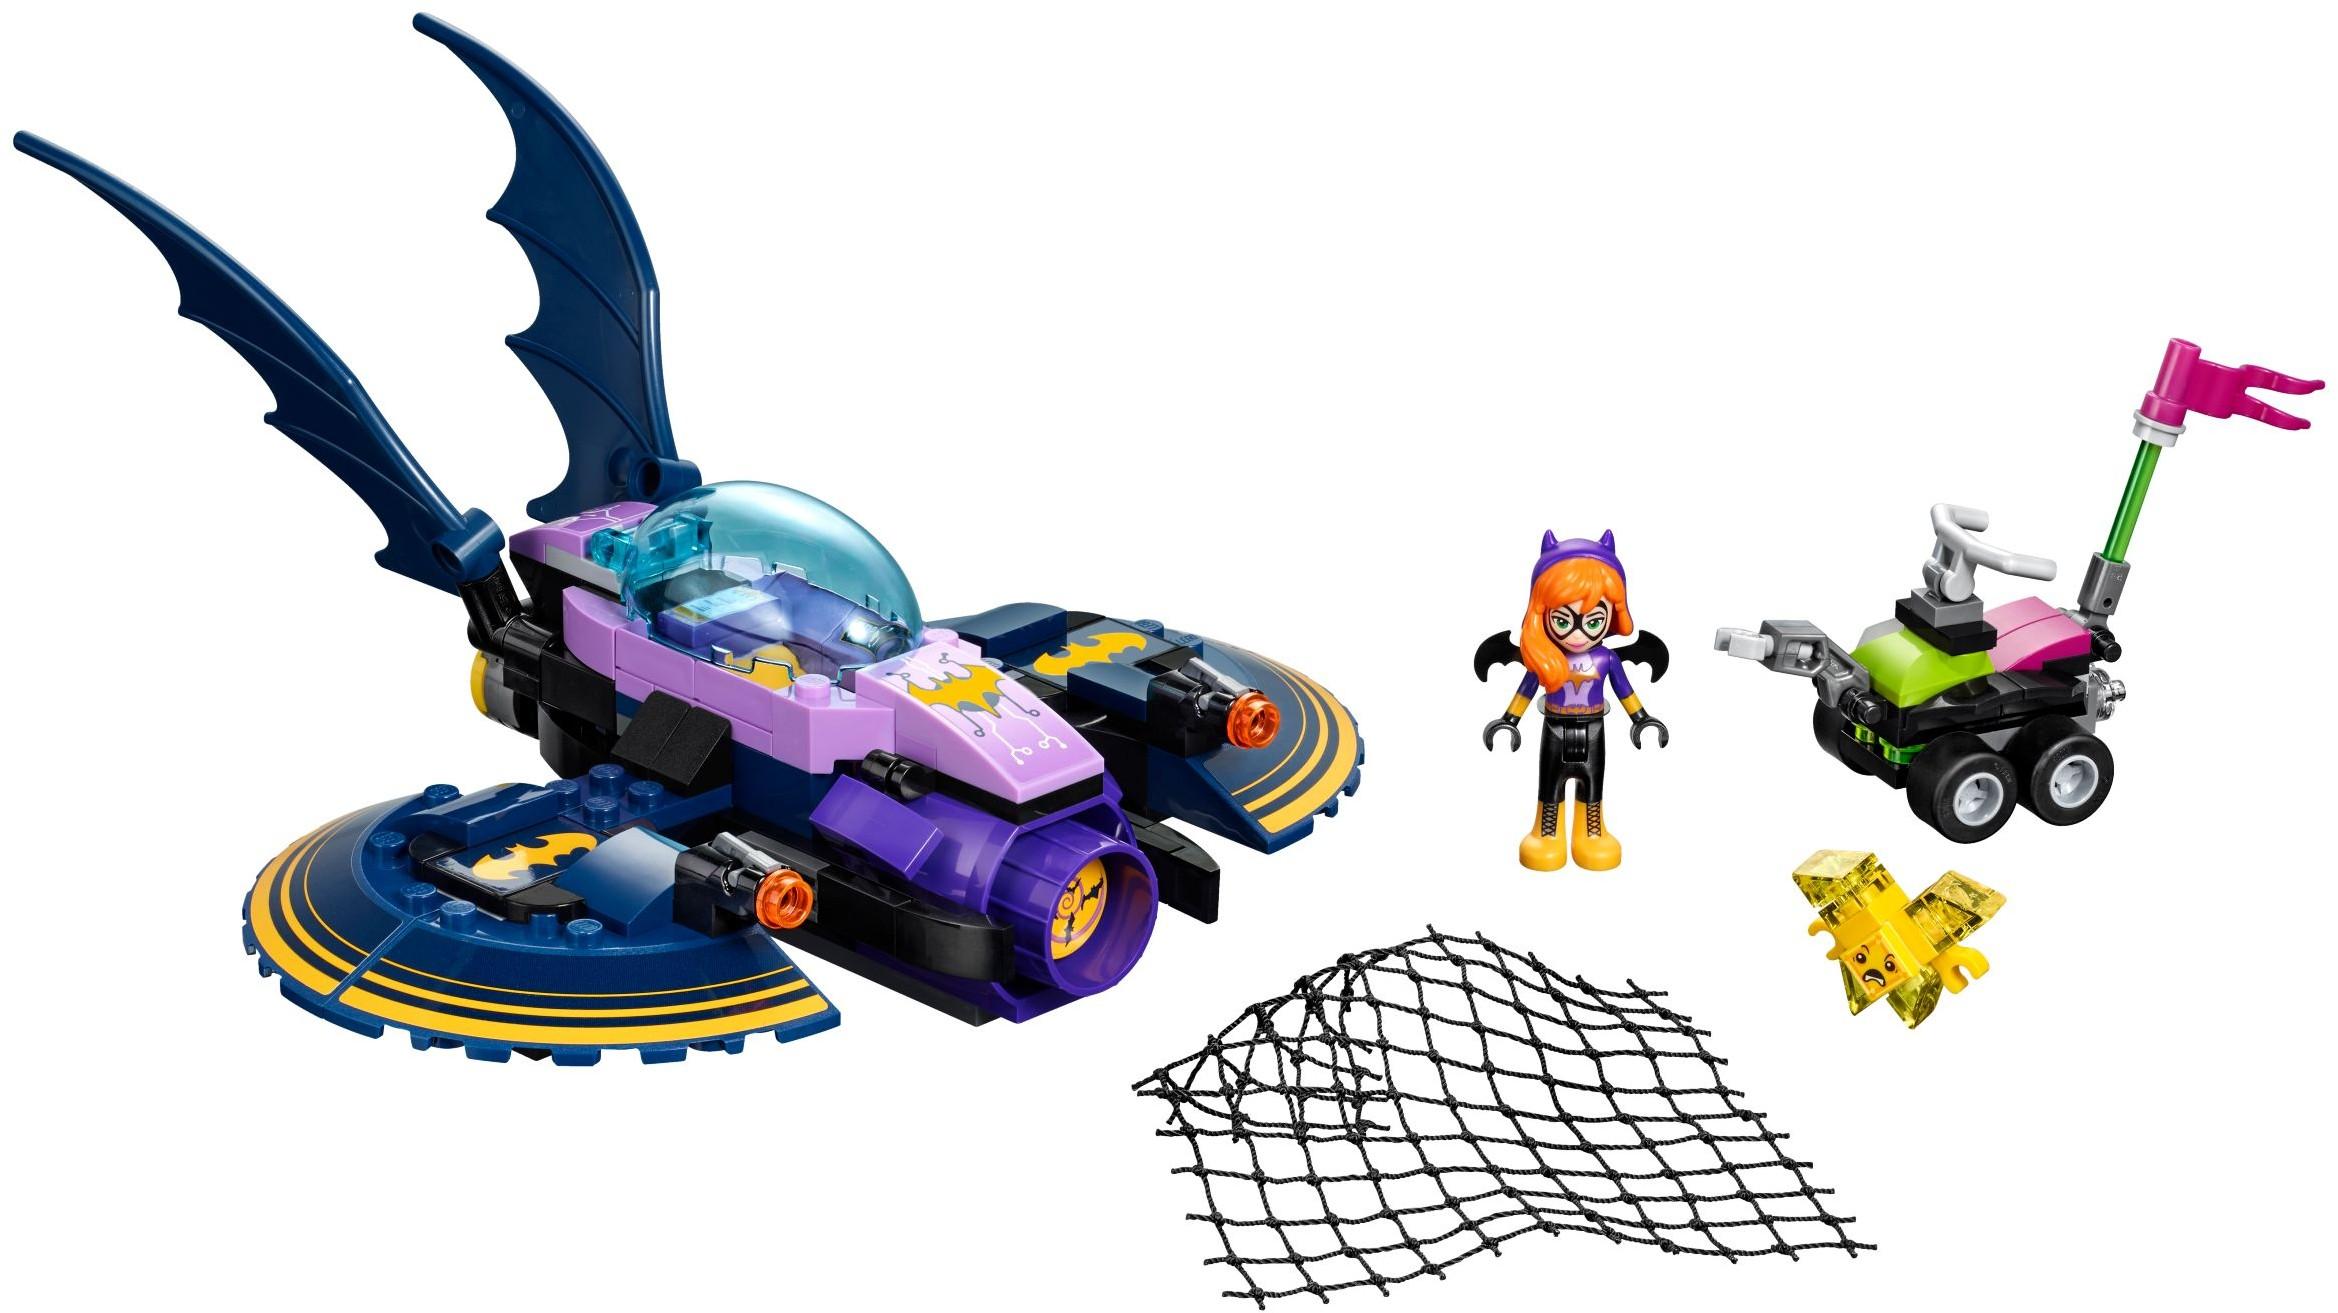 Mua đồ chơi LEGO 41230 - LEGO DC Super Hero Girls 41230 - Máy Bay Betjet của Batgirl (LEGO DC Super Hero Girls Batgirl Batjet Chase 41230)